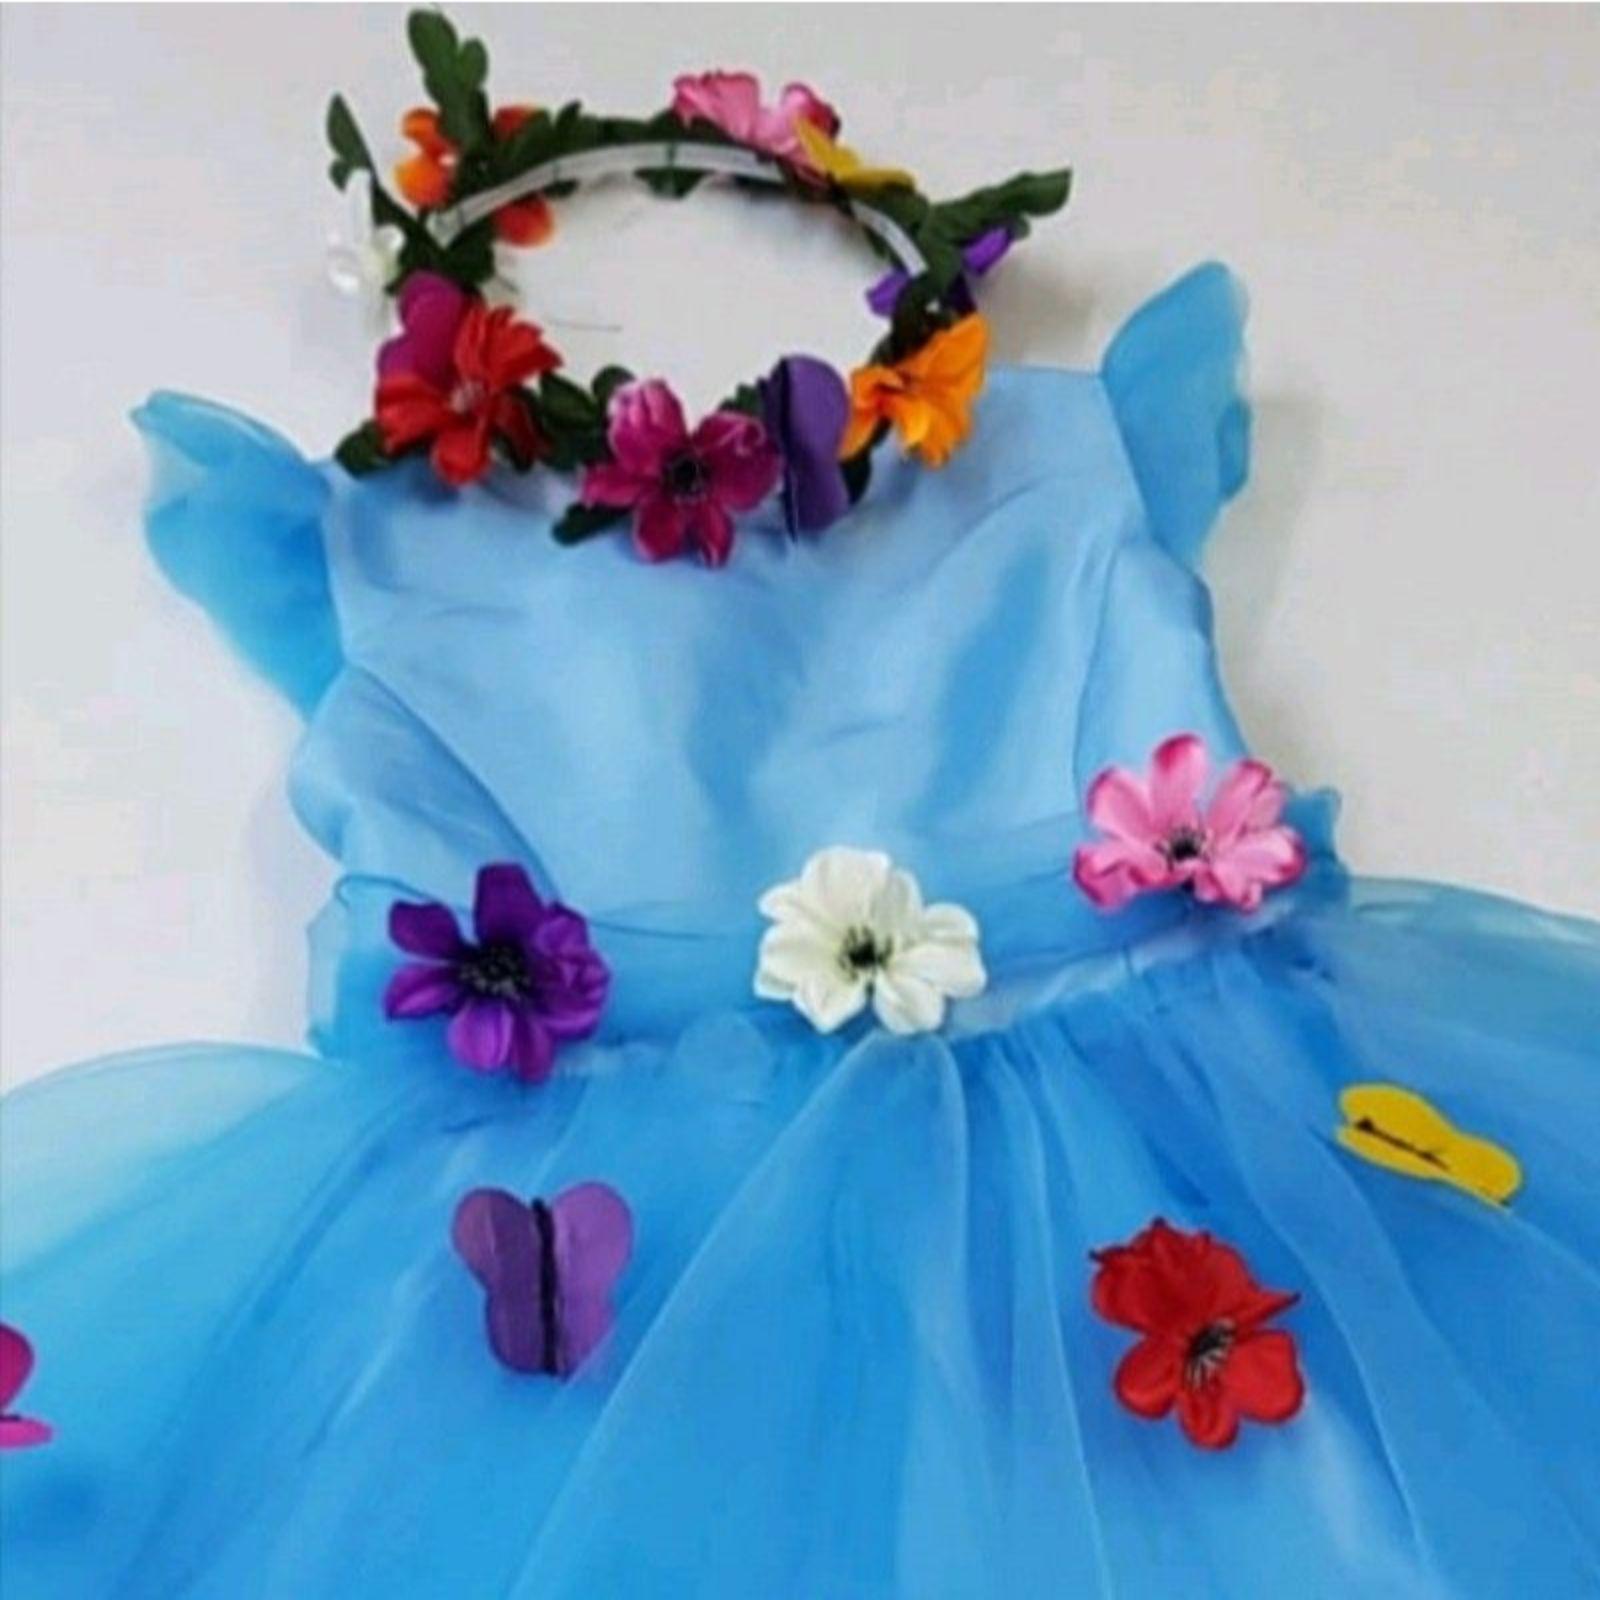 Prințesa bleu cu flori și fluturași 4